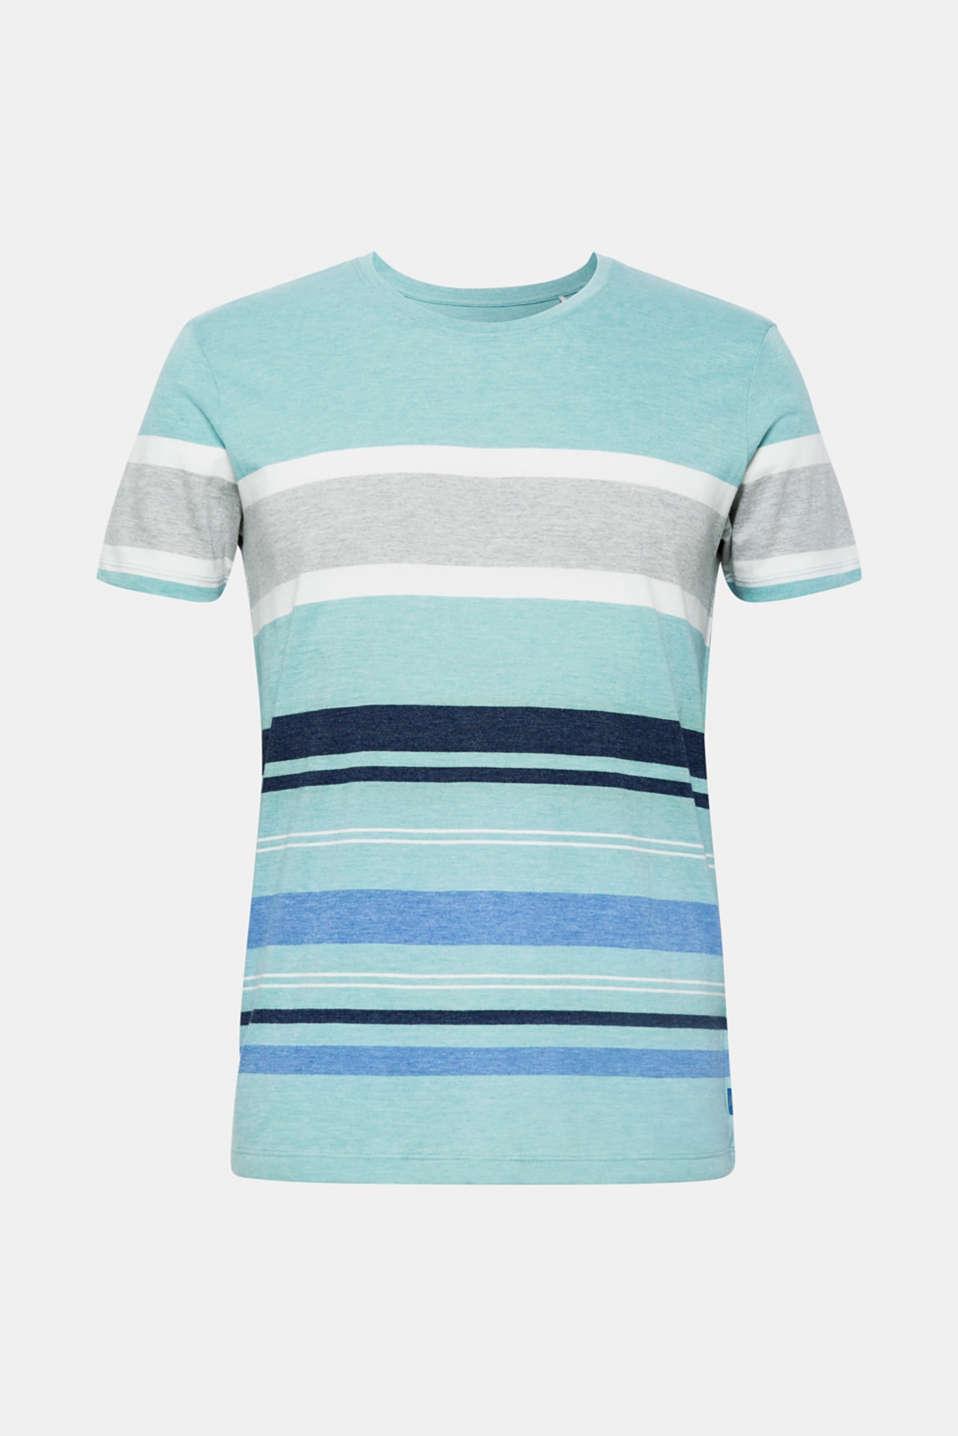 Striped jersey T-shirt, LIGHT AQUA GREEN, detail image number 6